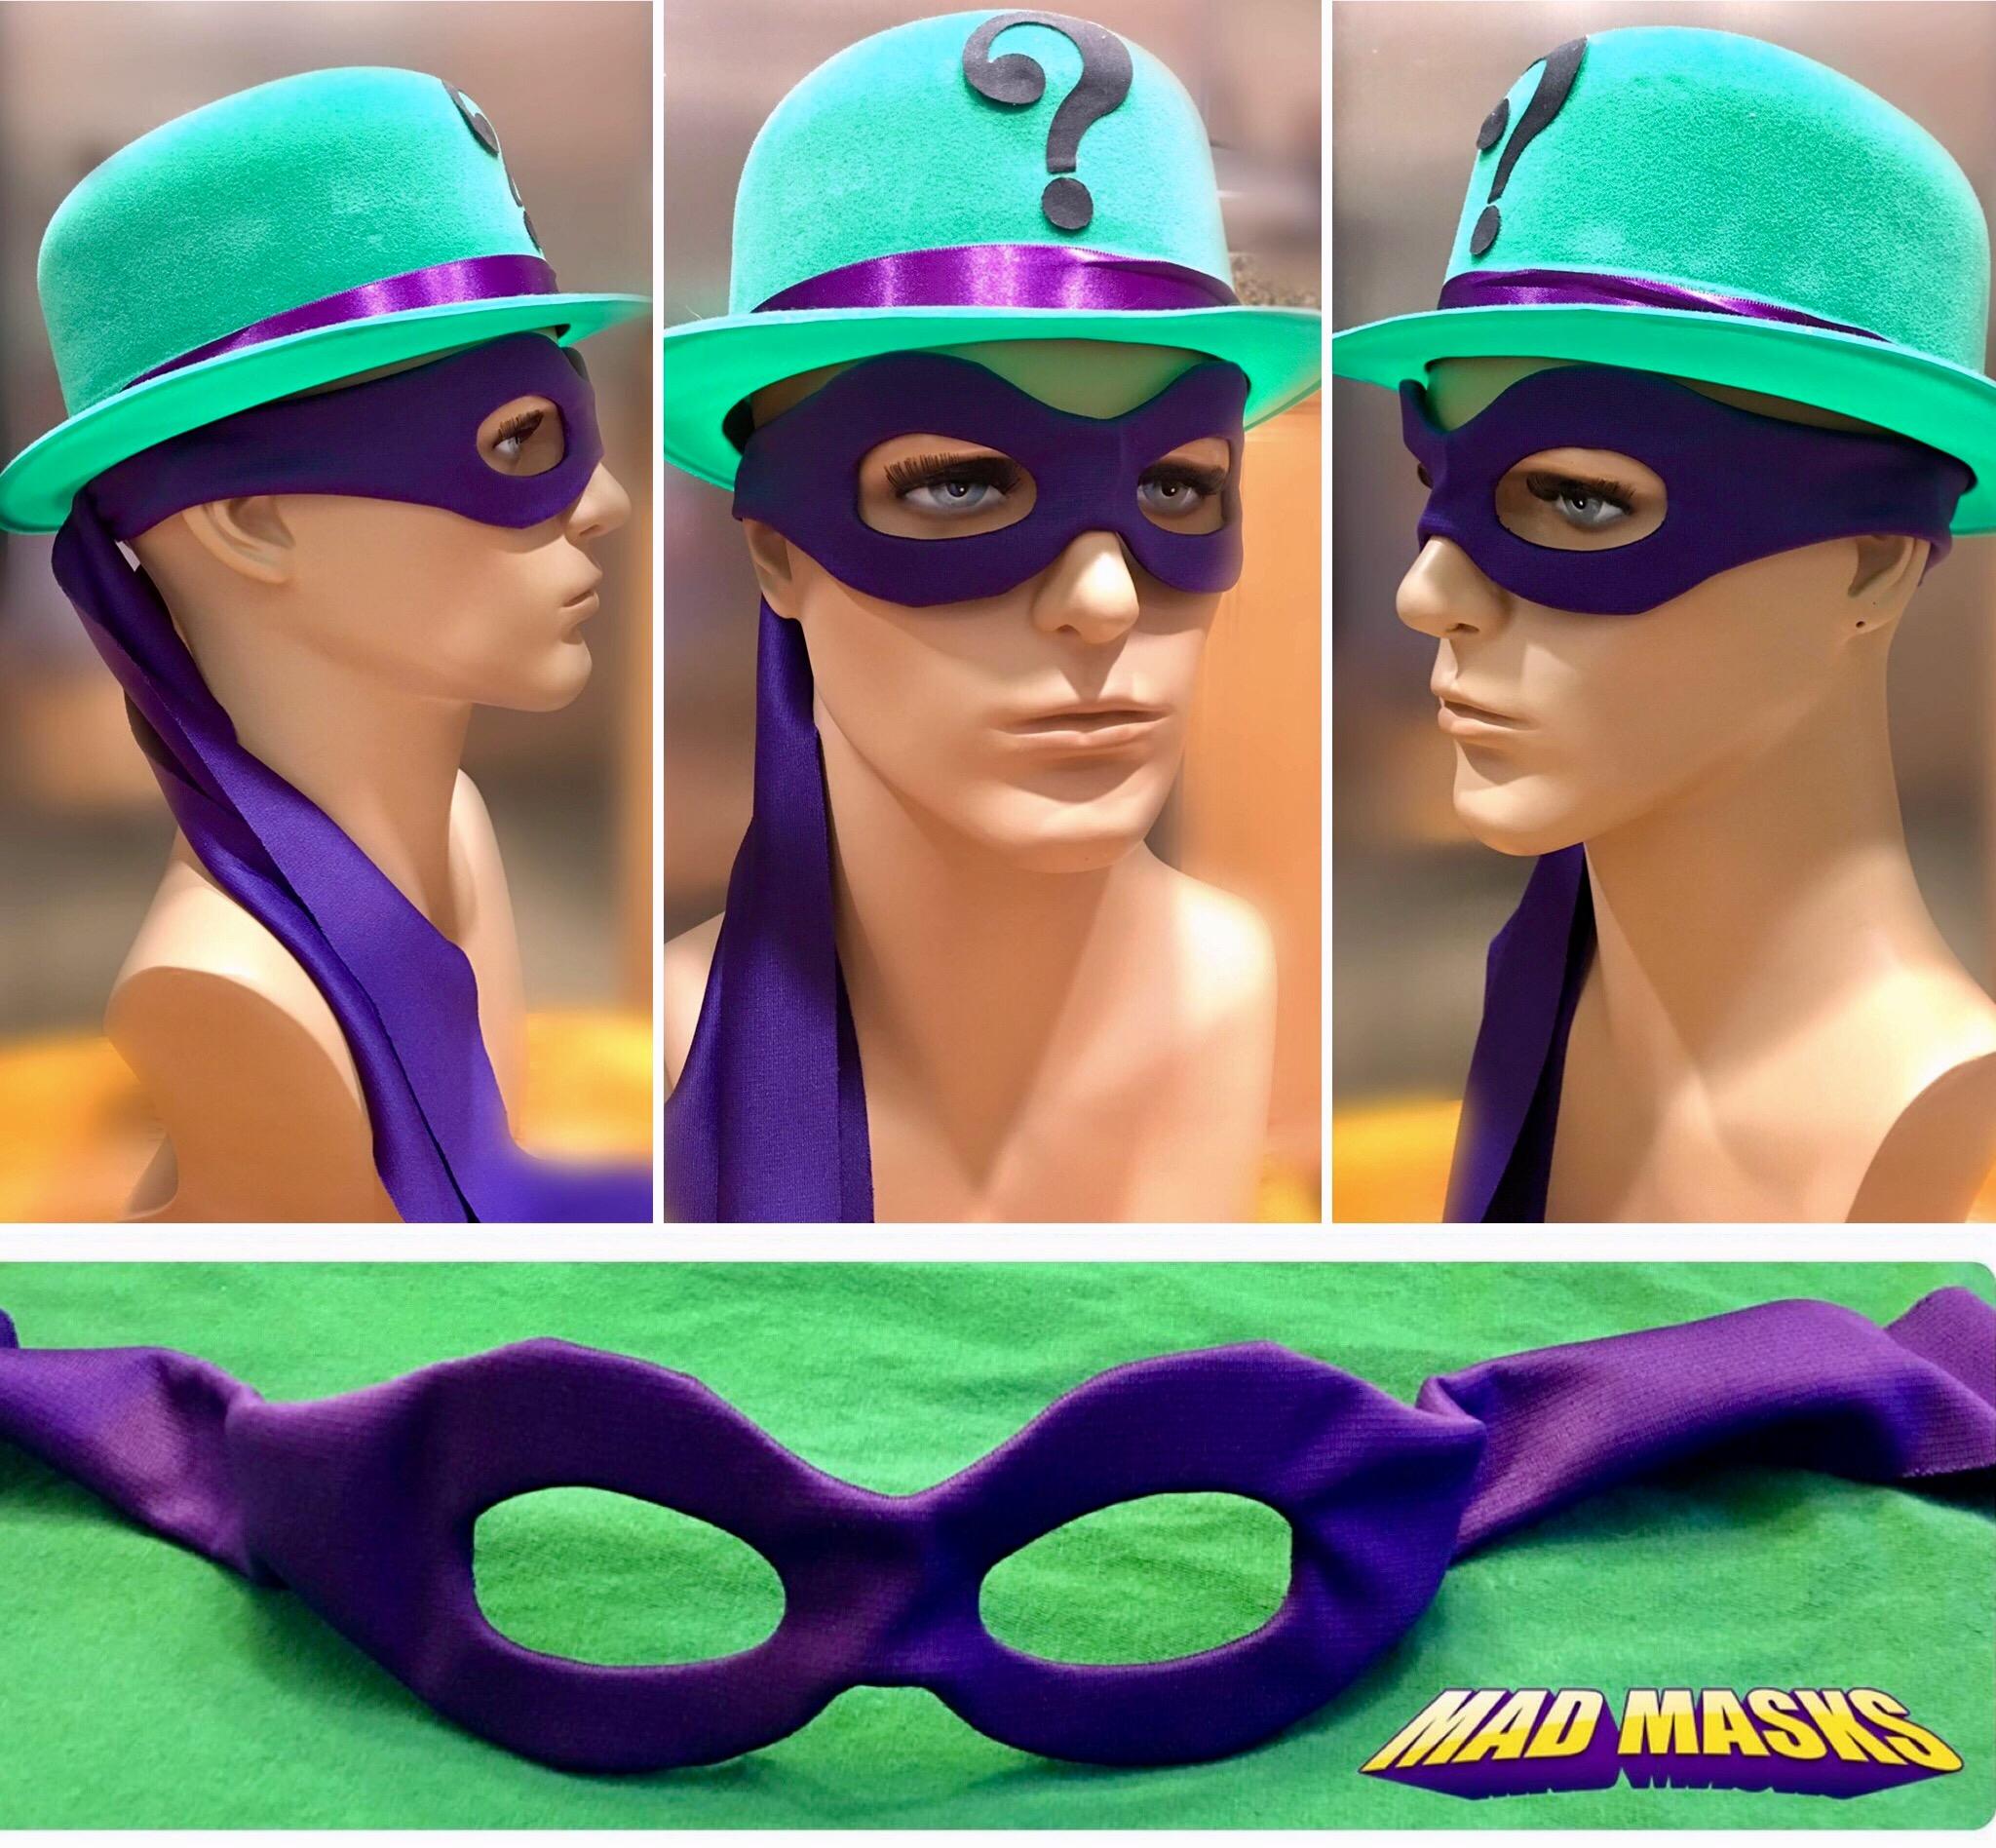 riddler-zero-year-mask-commission.jpg